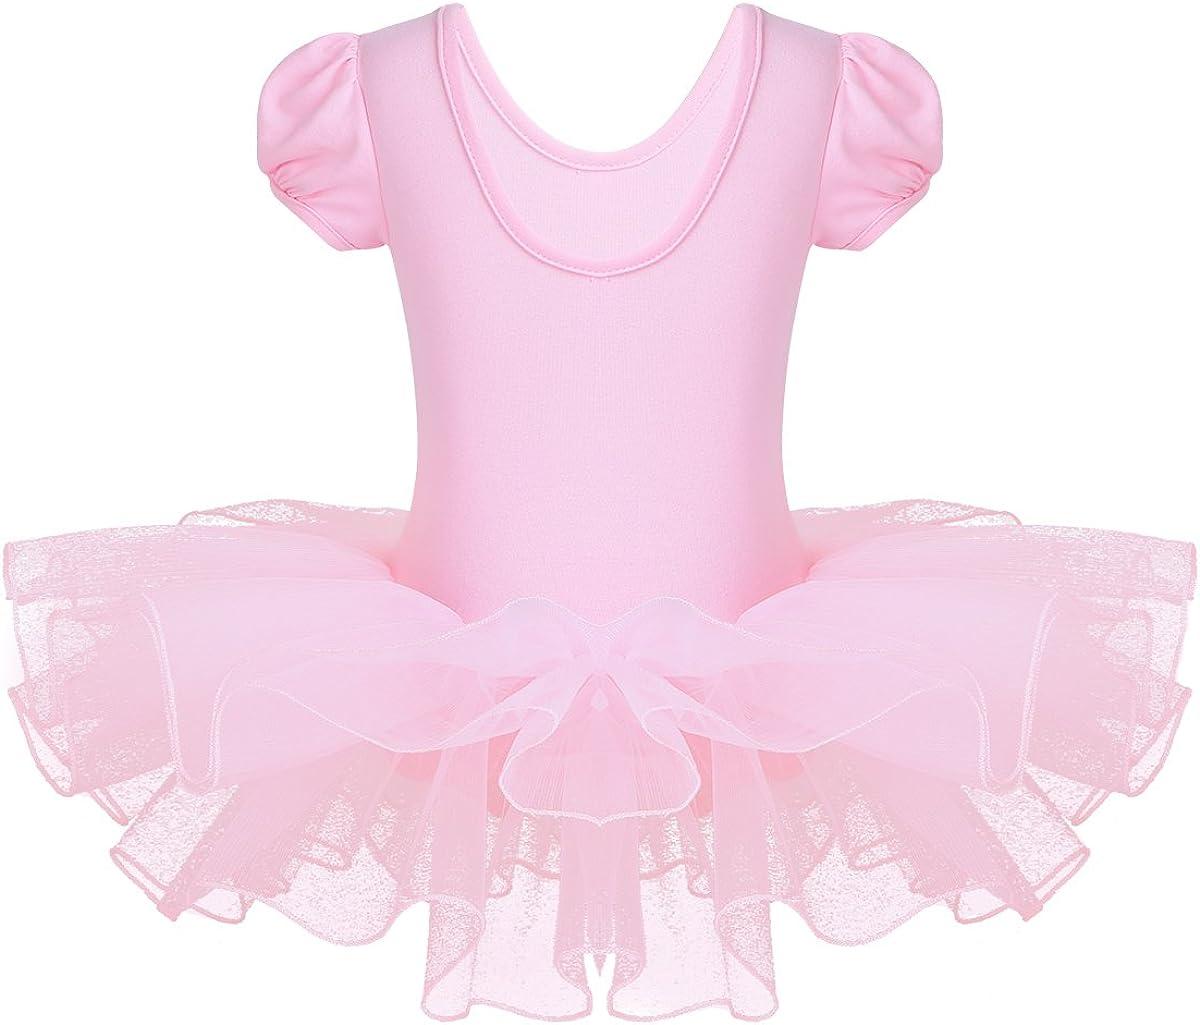 Aislor Kids Toddlers Girls Sparkly Rhinestones Gymnastics Leotard Tutu Dress Ballerina Ballet Dance Costumes